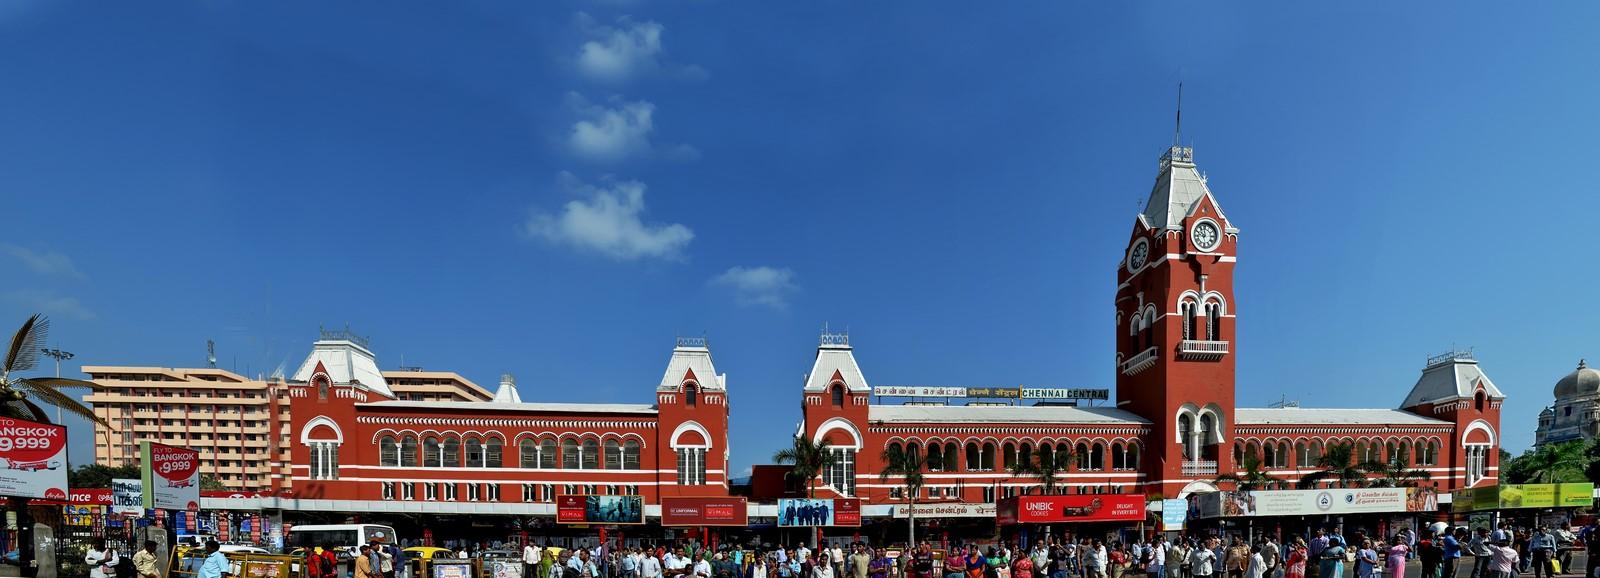 Chennai Central Railway Station - Sheet1